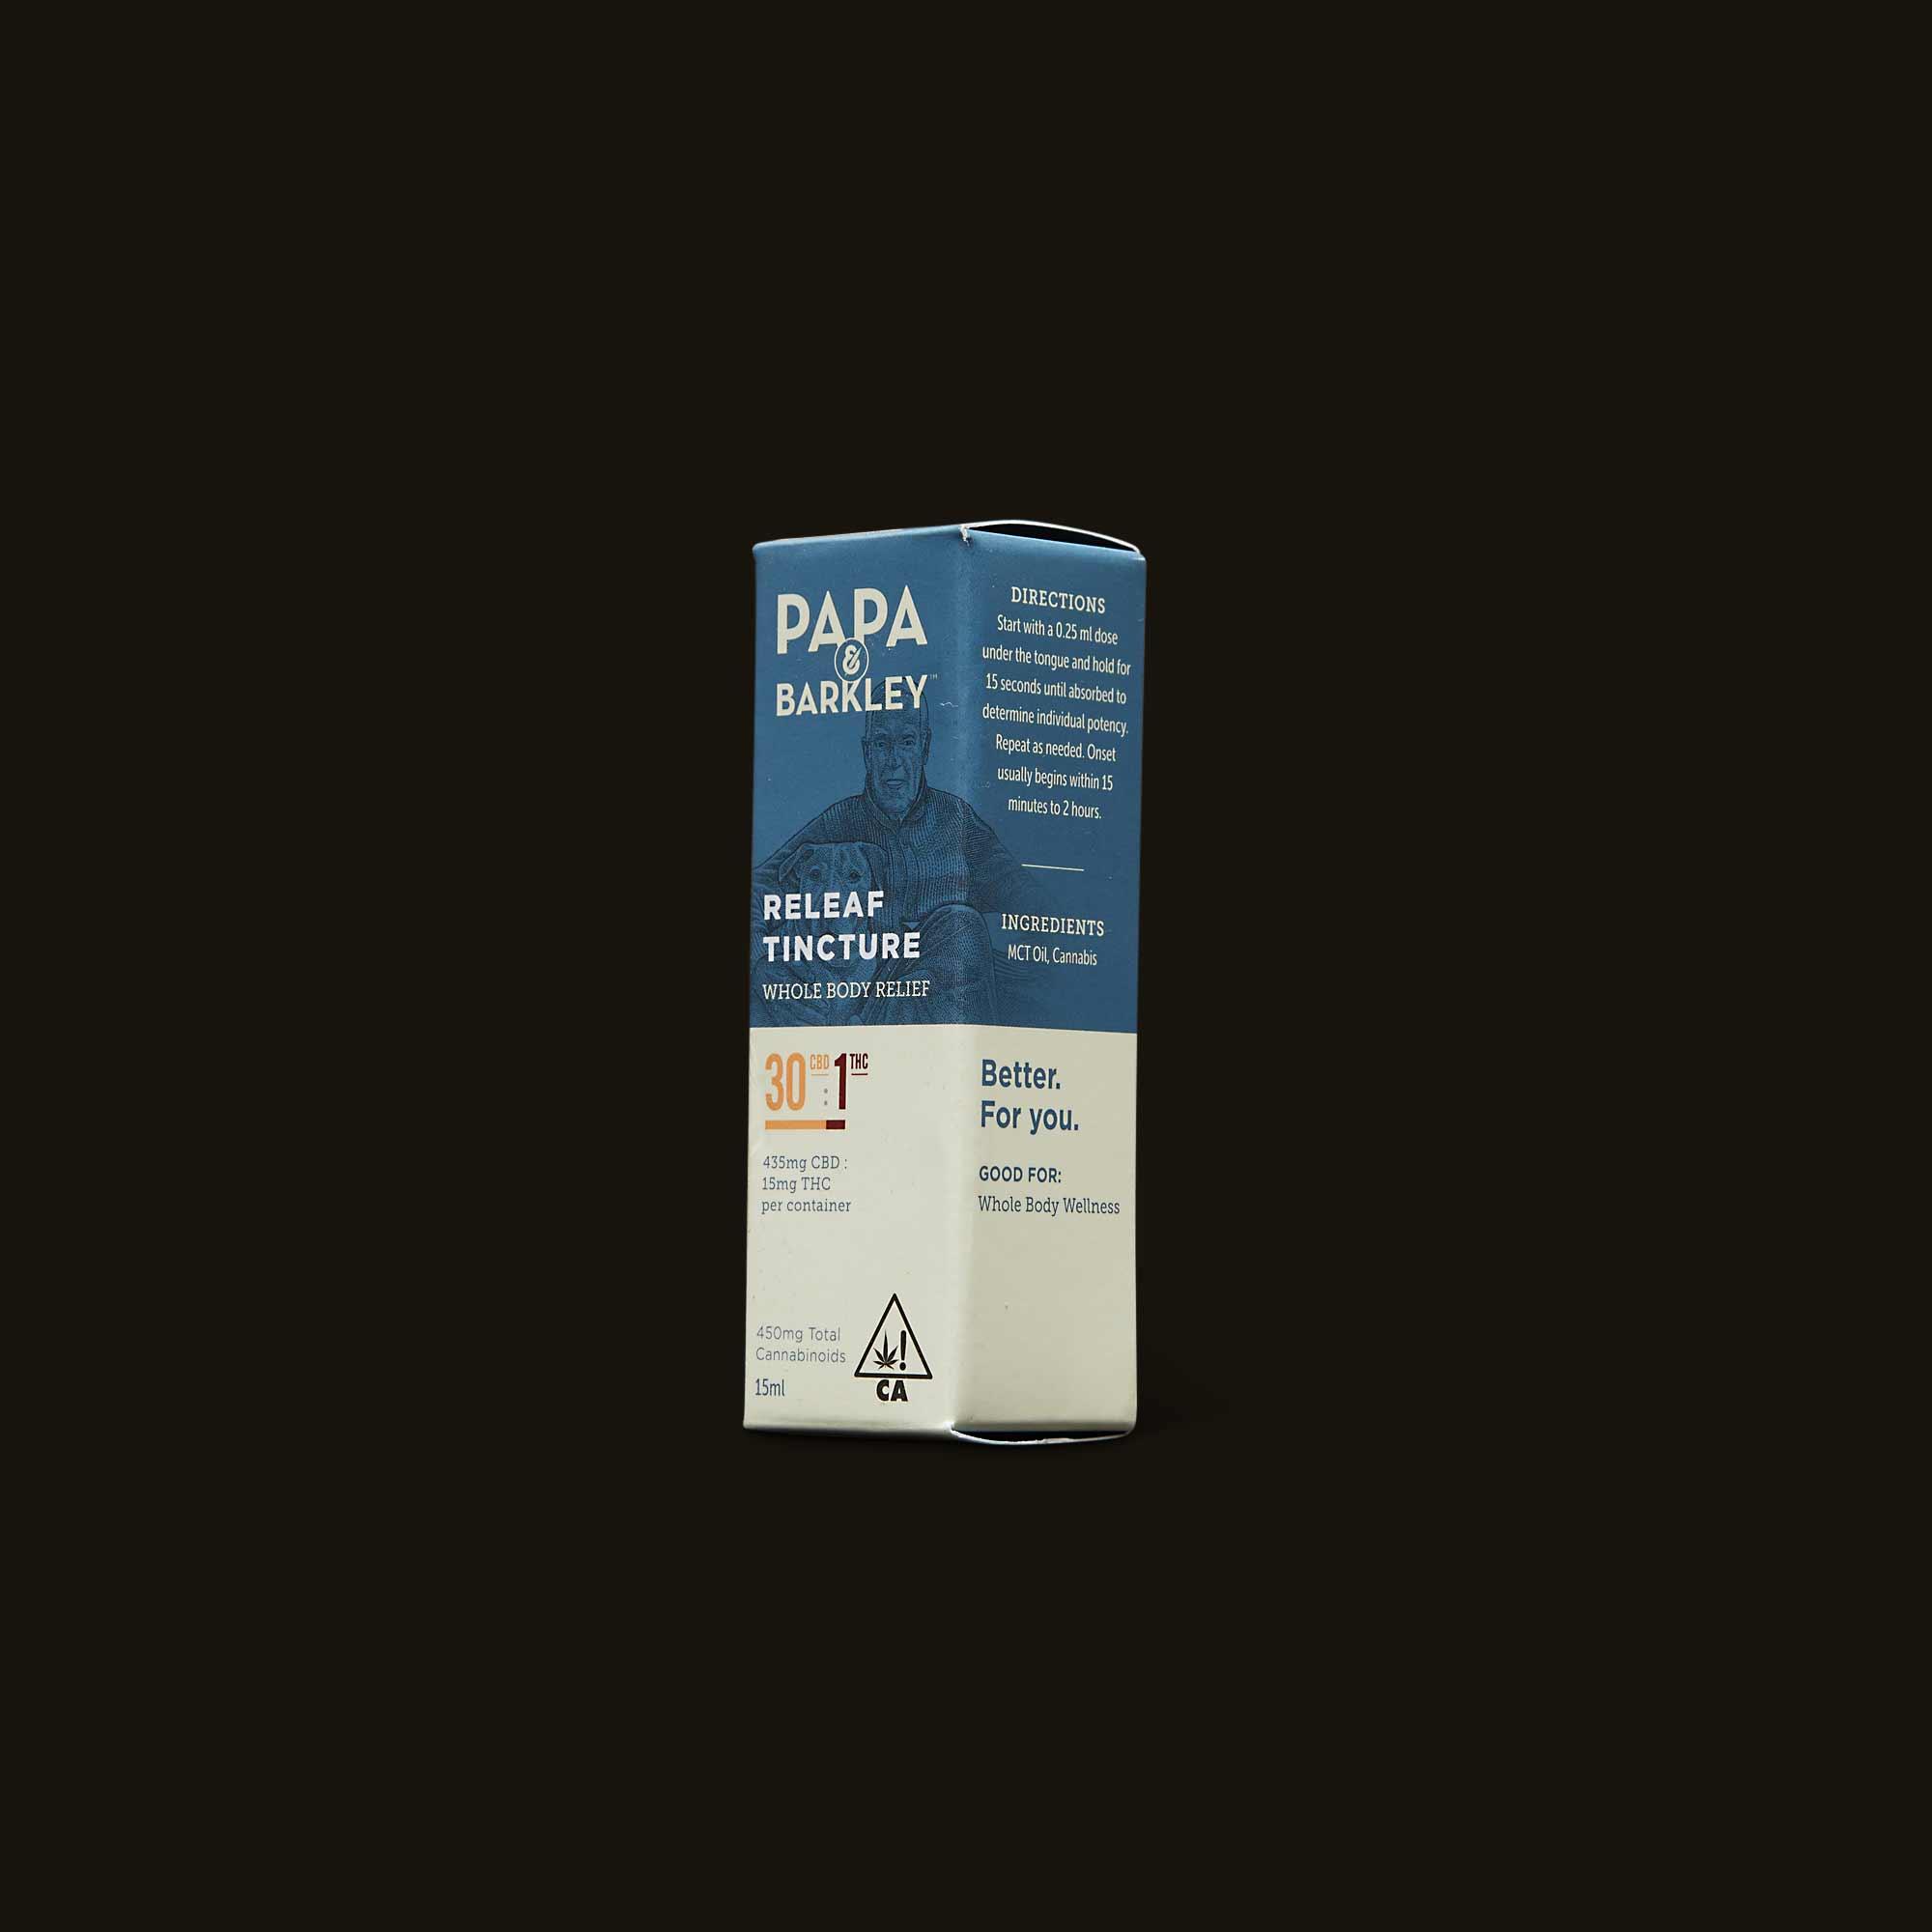 Papa & Barkley 30:1 CBD:THC Releaf Tincture